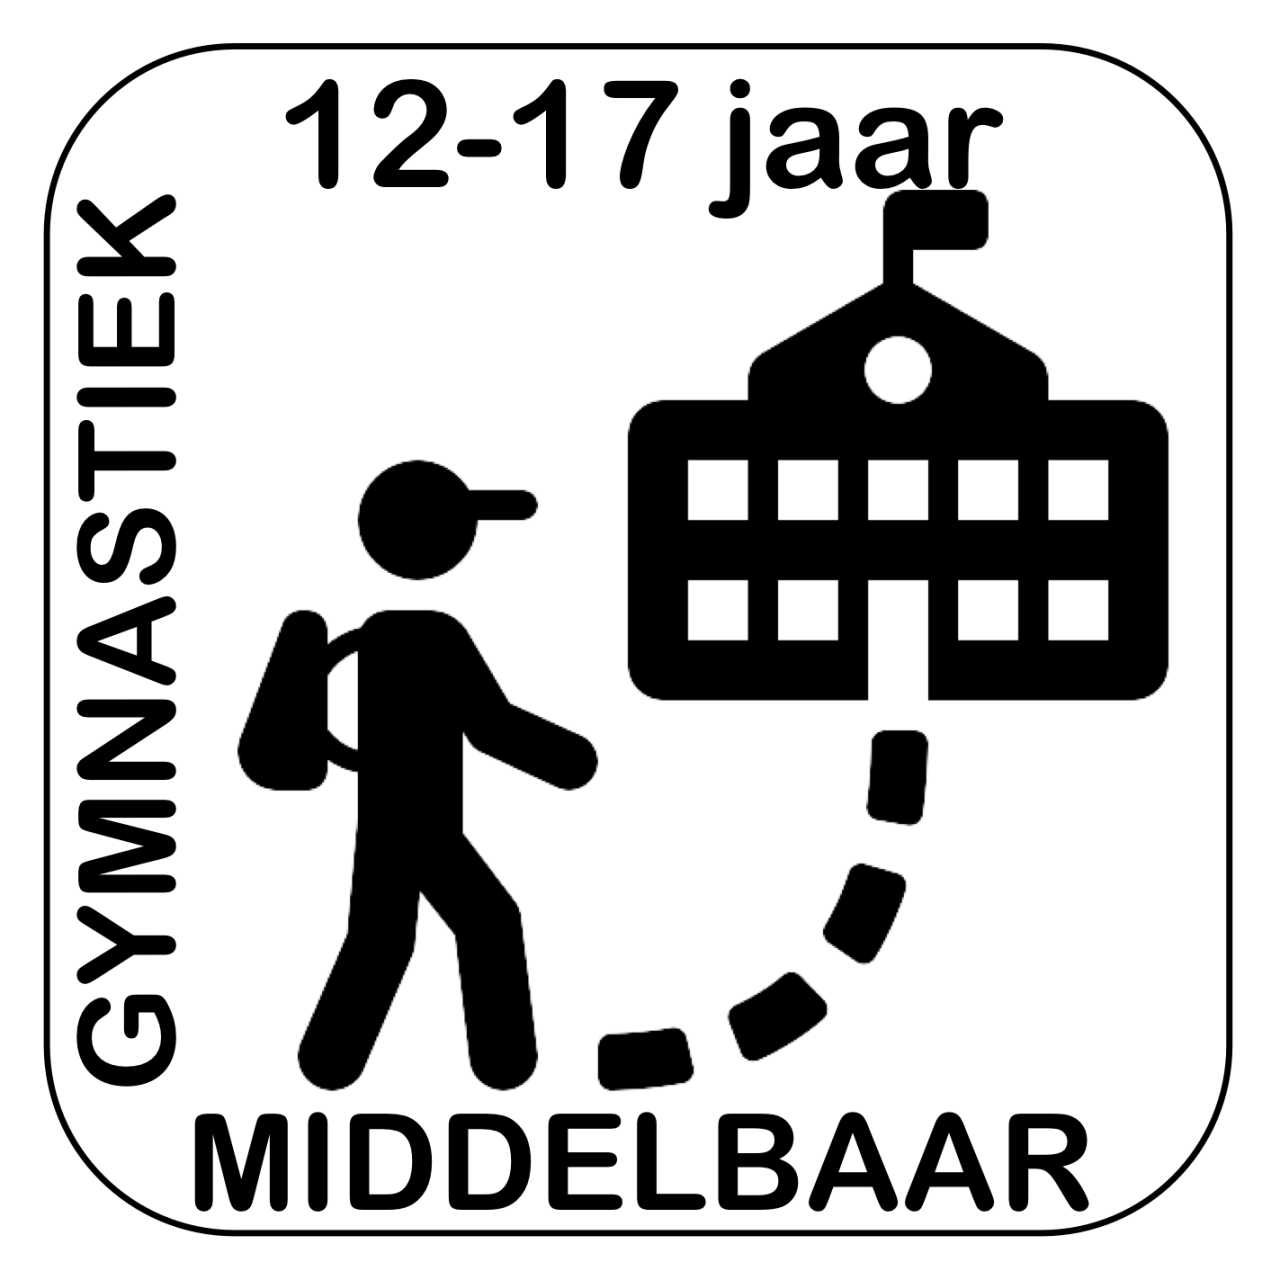 Logo GymFlex turnen middelbaar gymnastiek